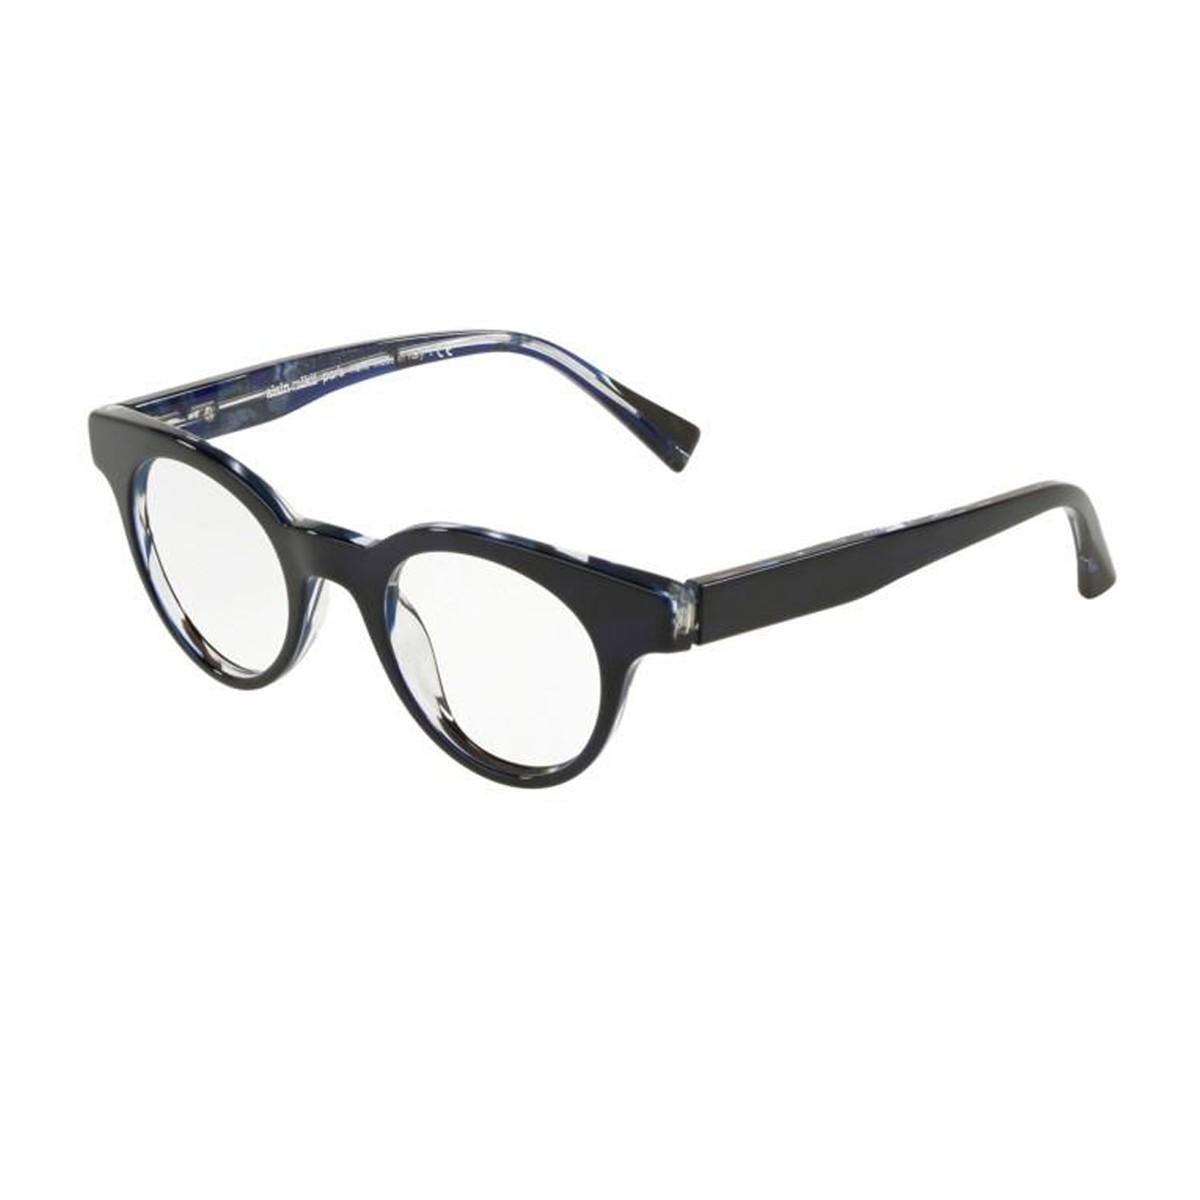 Alain Mikli 0A03090 | Occhiali da vista Unisex